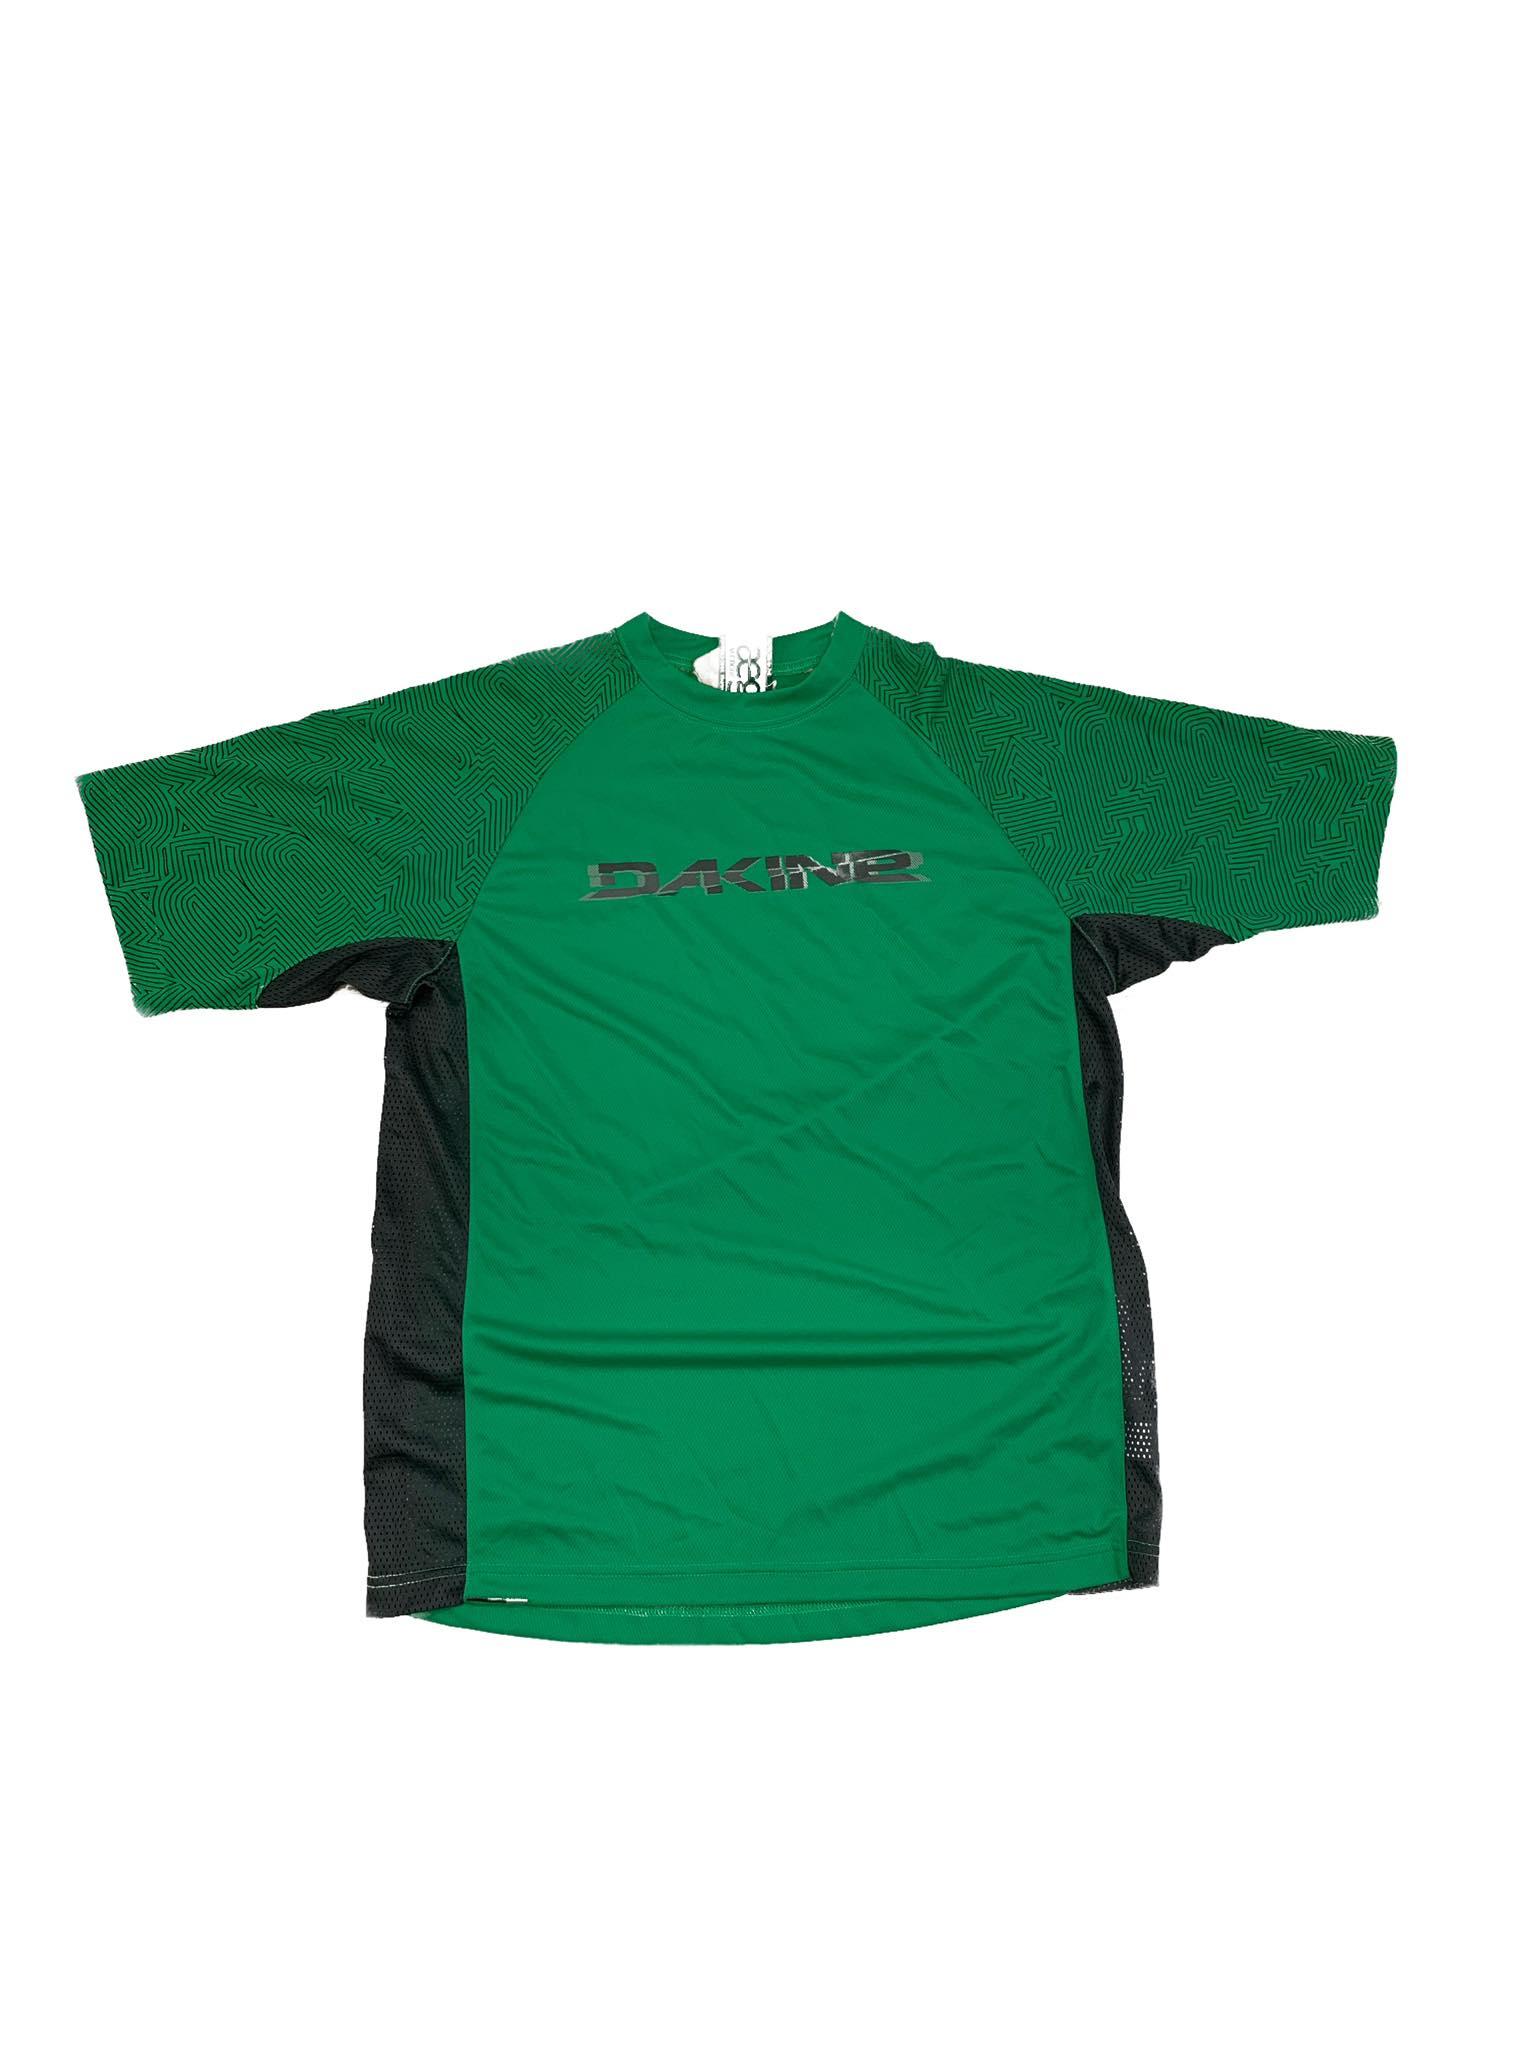 Shirt Bike Dakine Downhill ( More Colors )